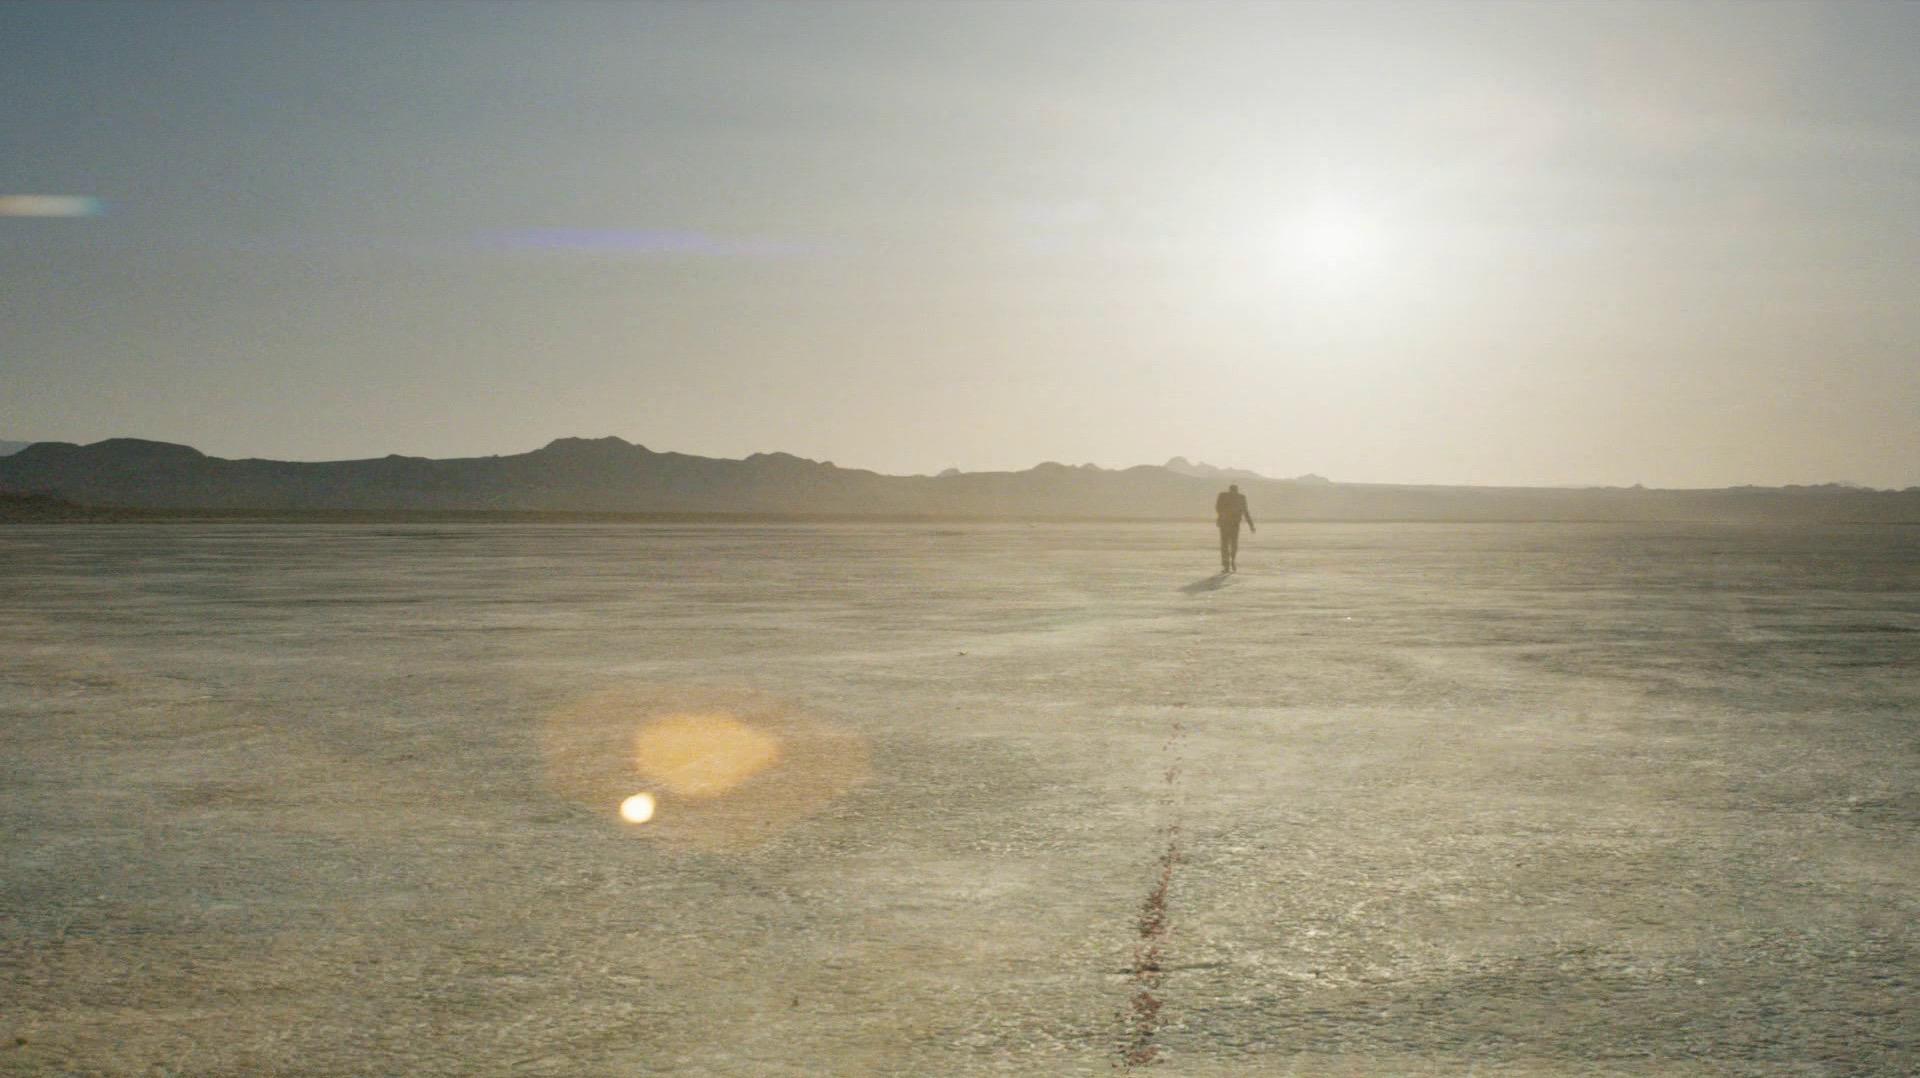 Frank walks through the desert